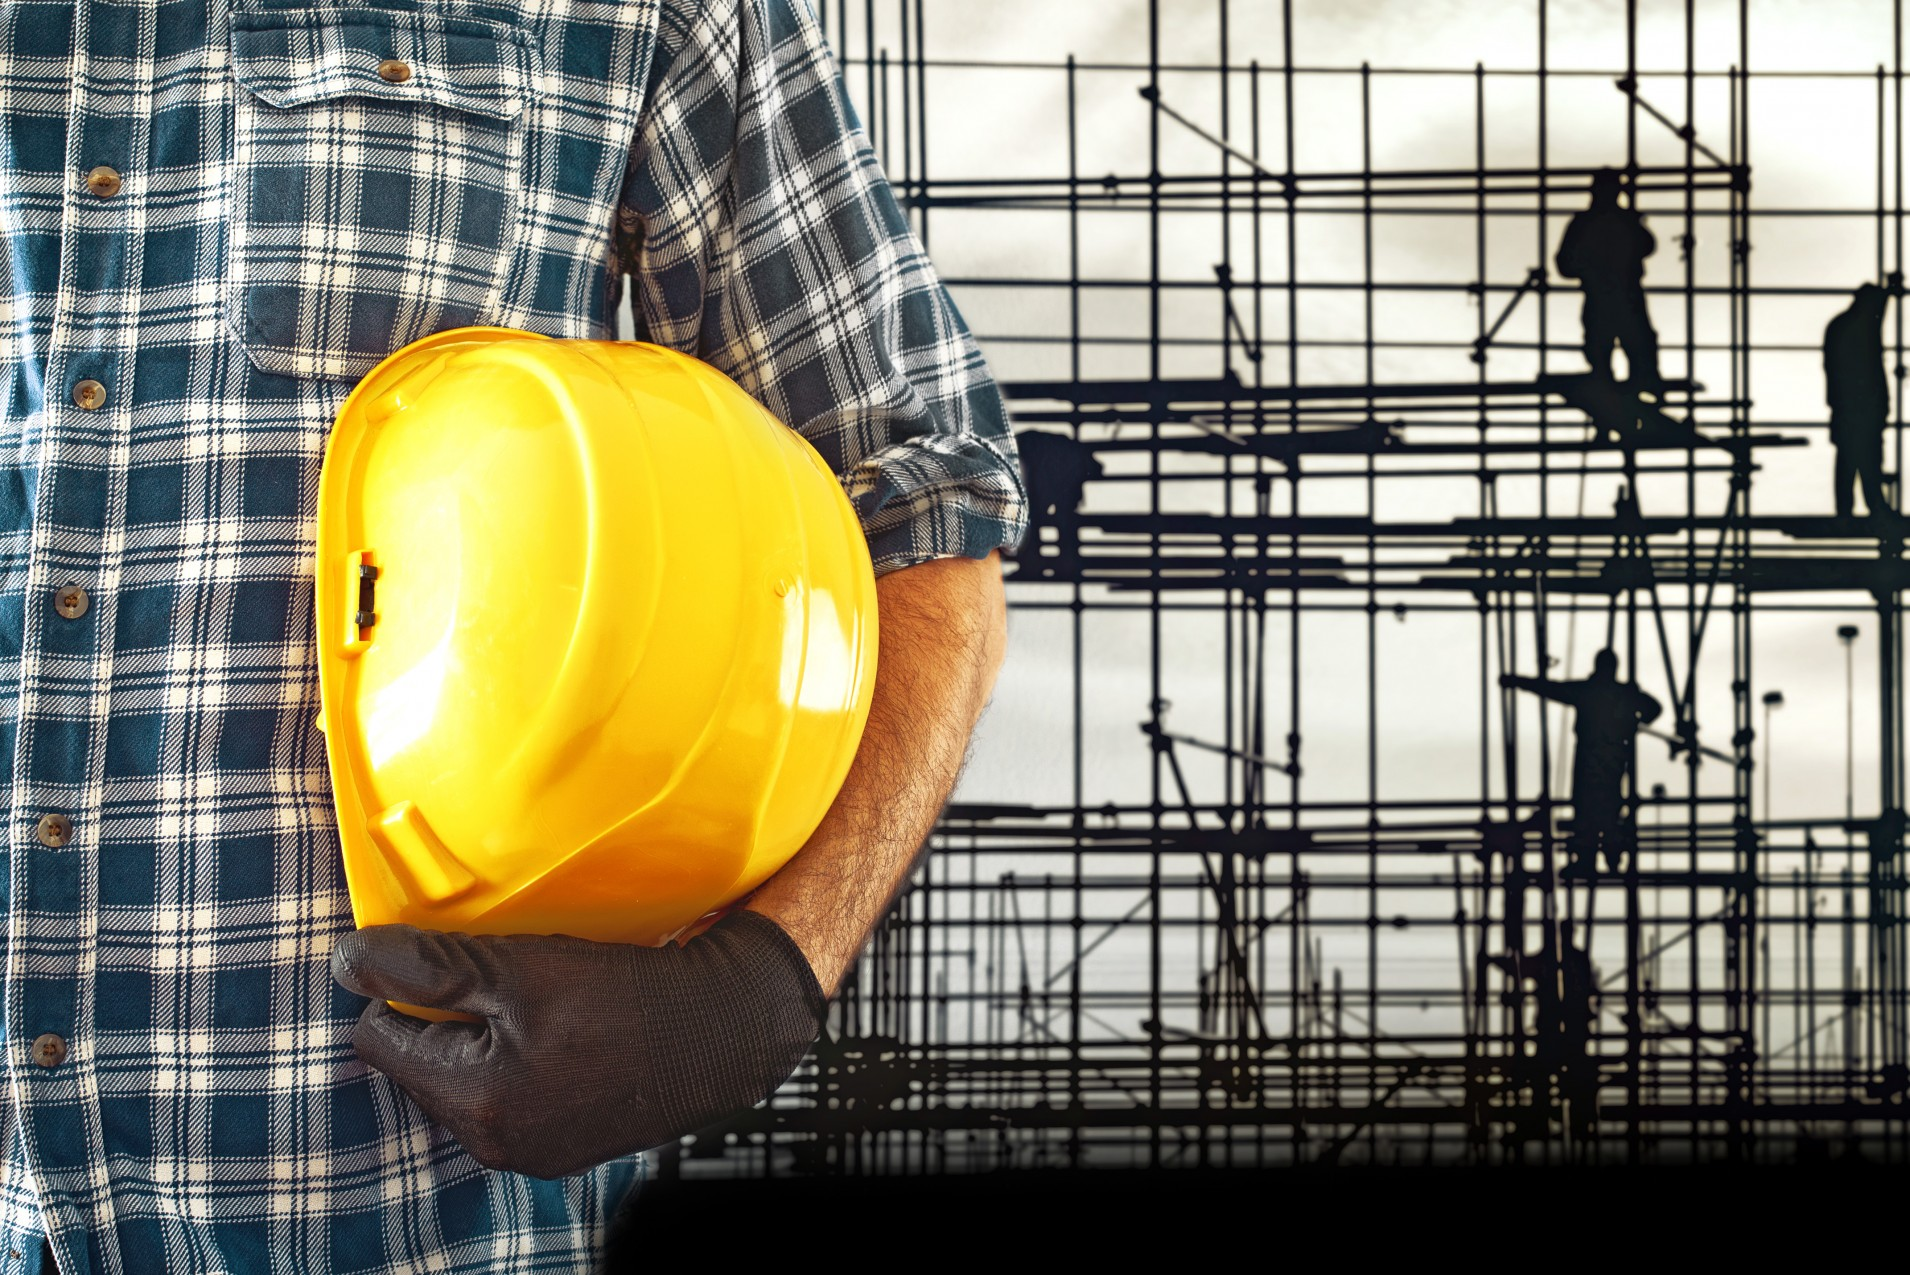 Schele-Metal.ro va ofera inchiriere schele fixe pentru lucrari sigure si eficiente